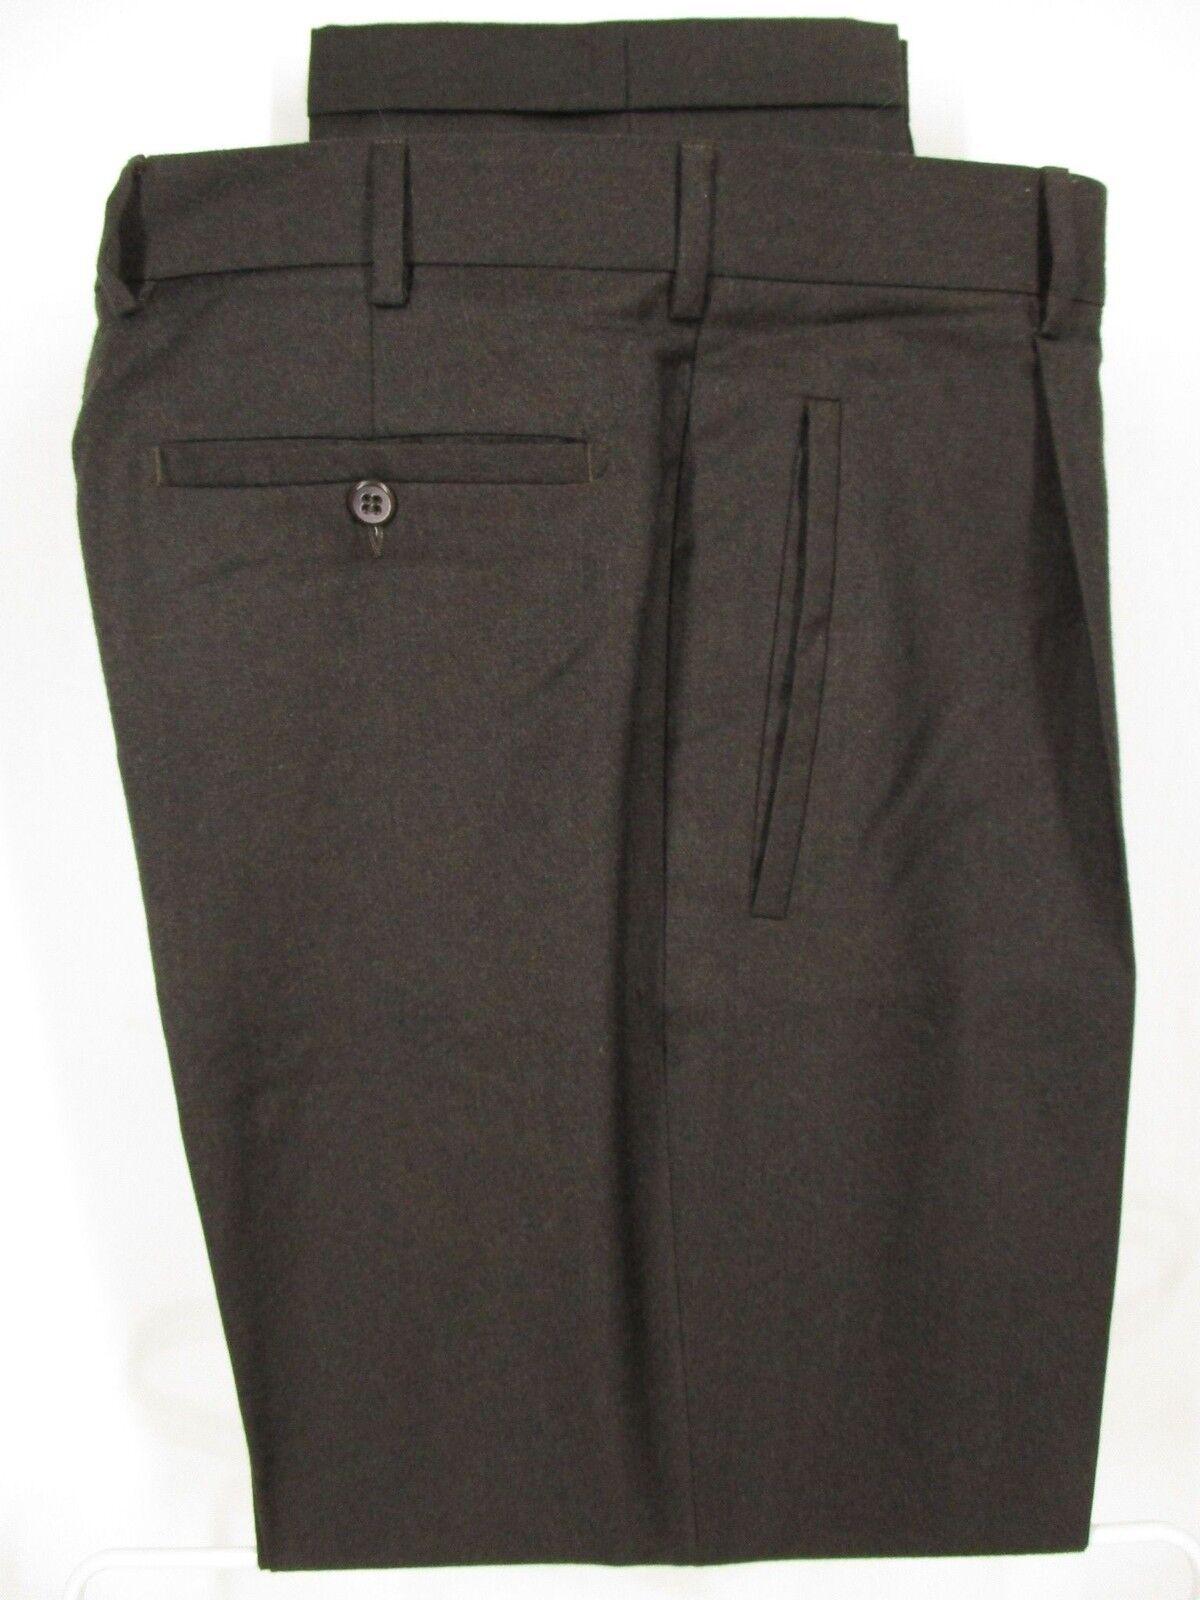 Zanella Bob Mens Charcoal Pleated Wool Dress Pants size 34 34x30